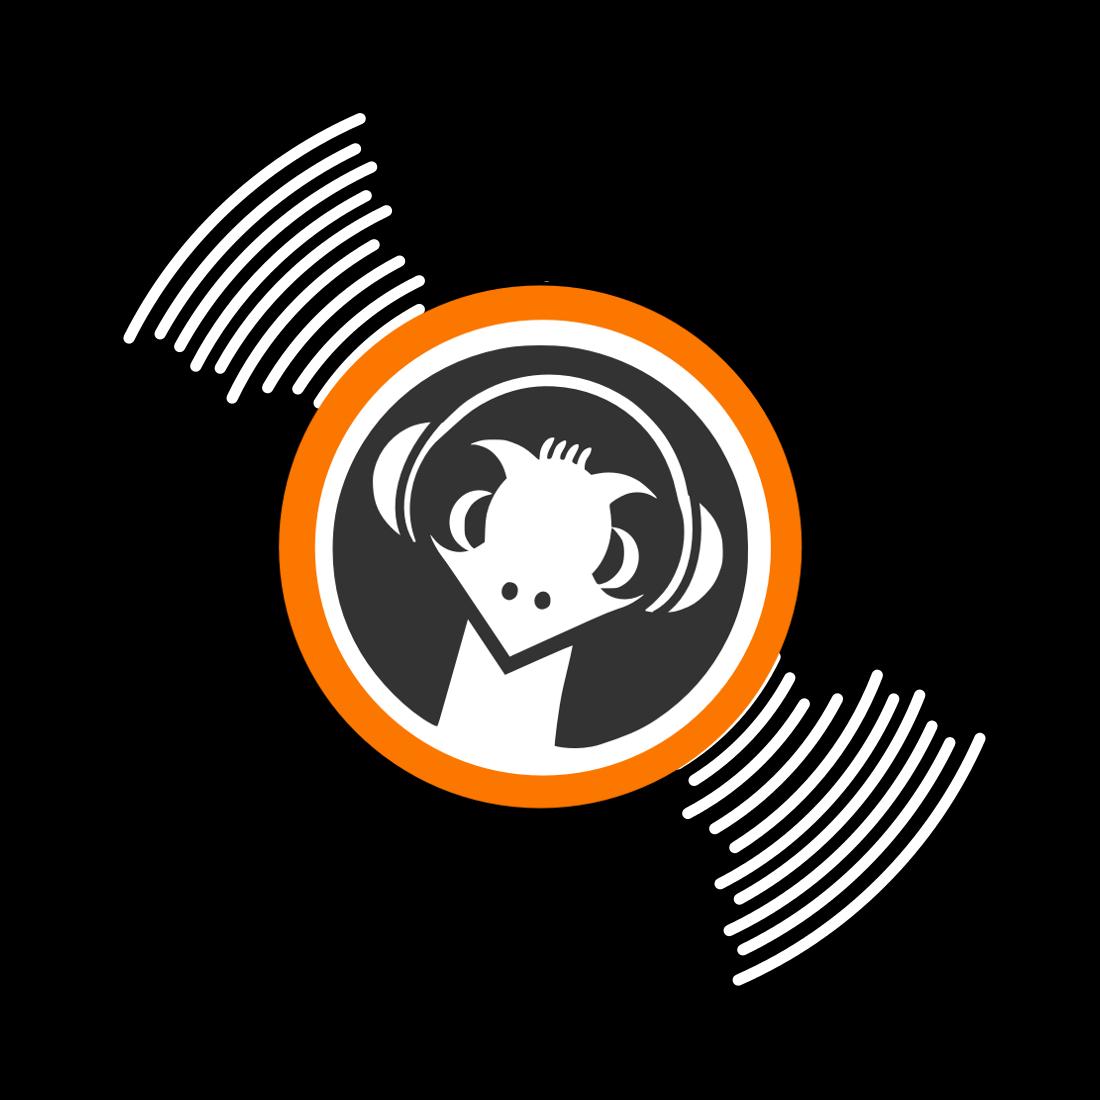 [Calyman] Noodles in Flames